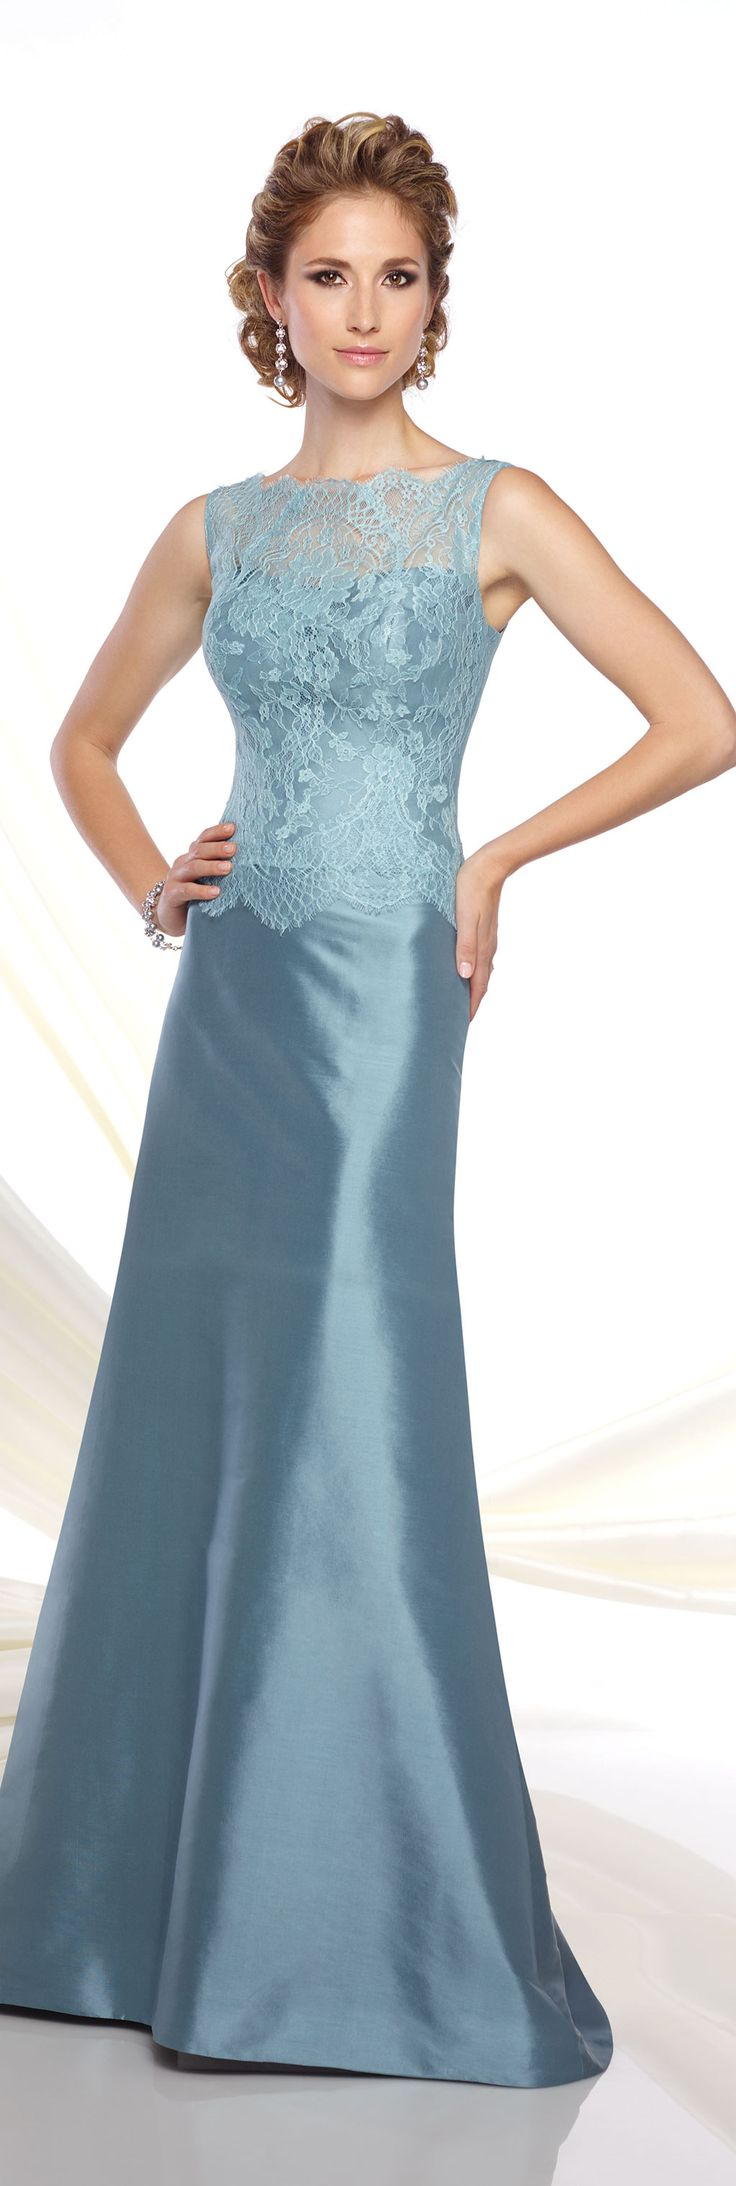 88 best Šaty na Promócie/ Graduation ceremony dress images on ...